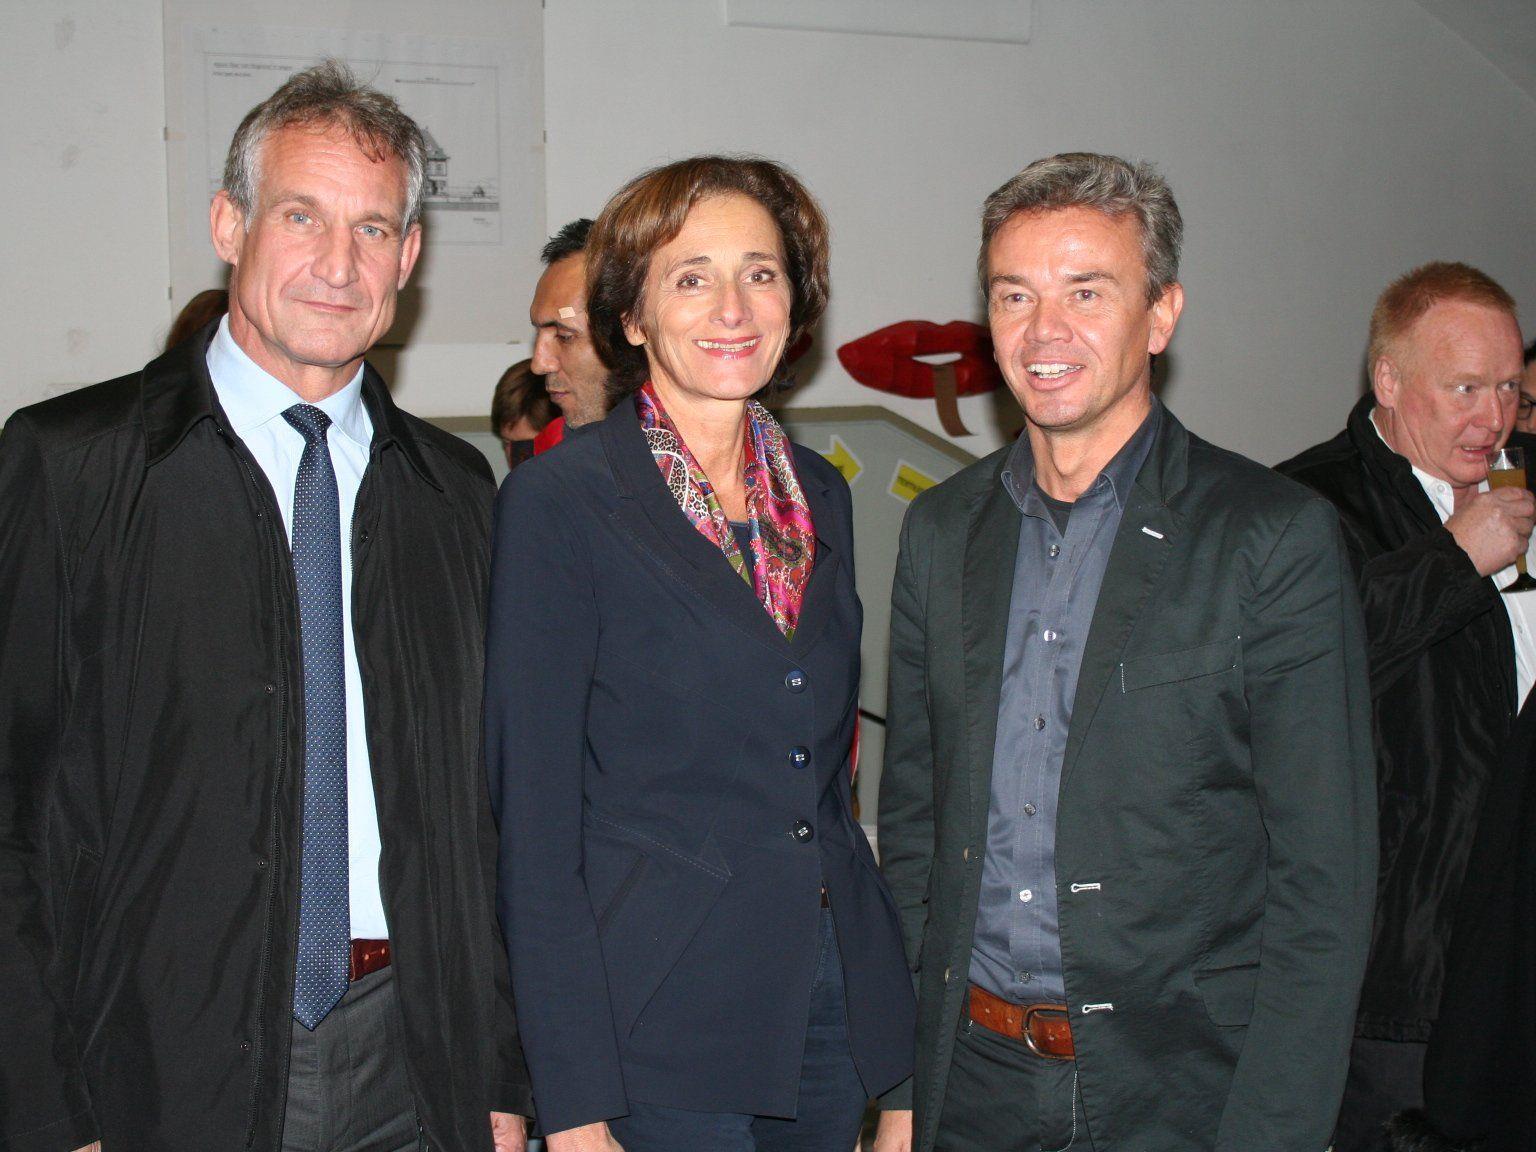 Bürgermeister Markus Linhard, Bernadette Mennel, Elmar Halder